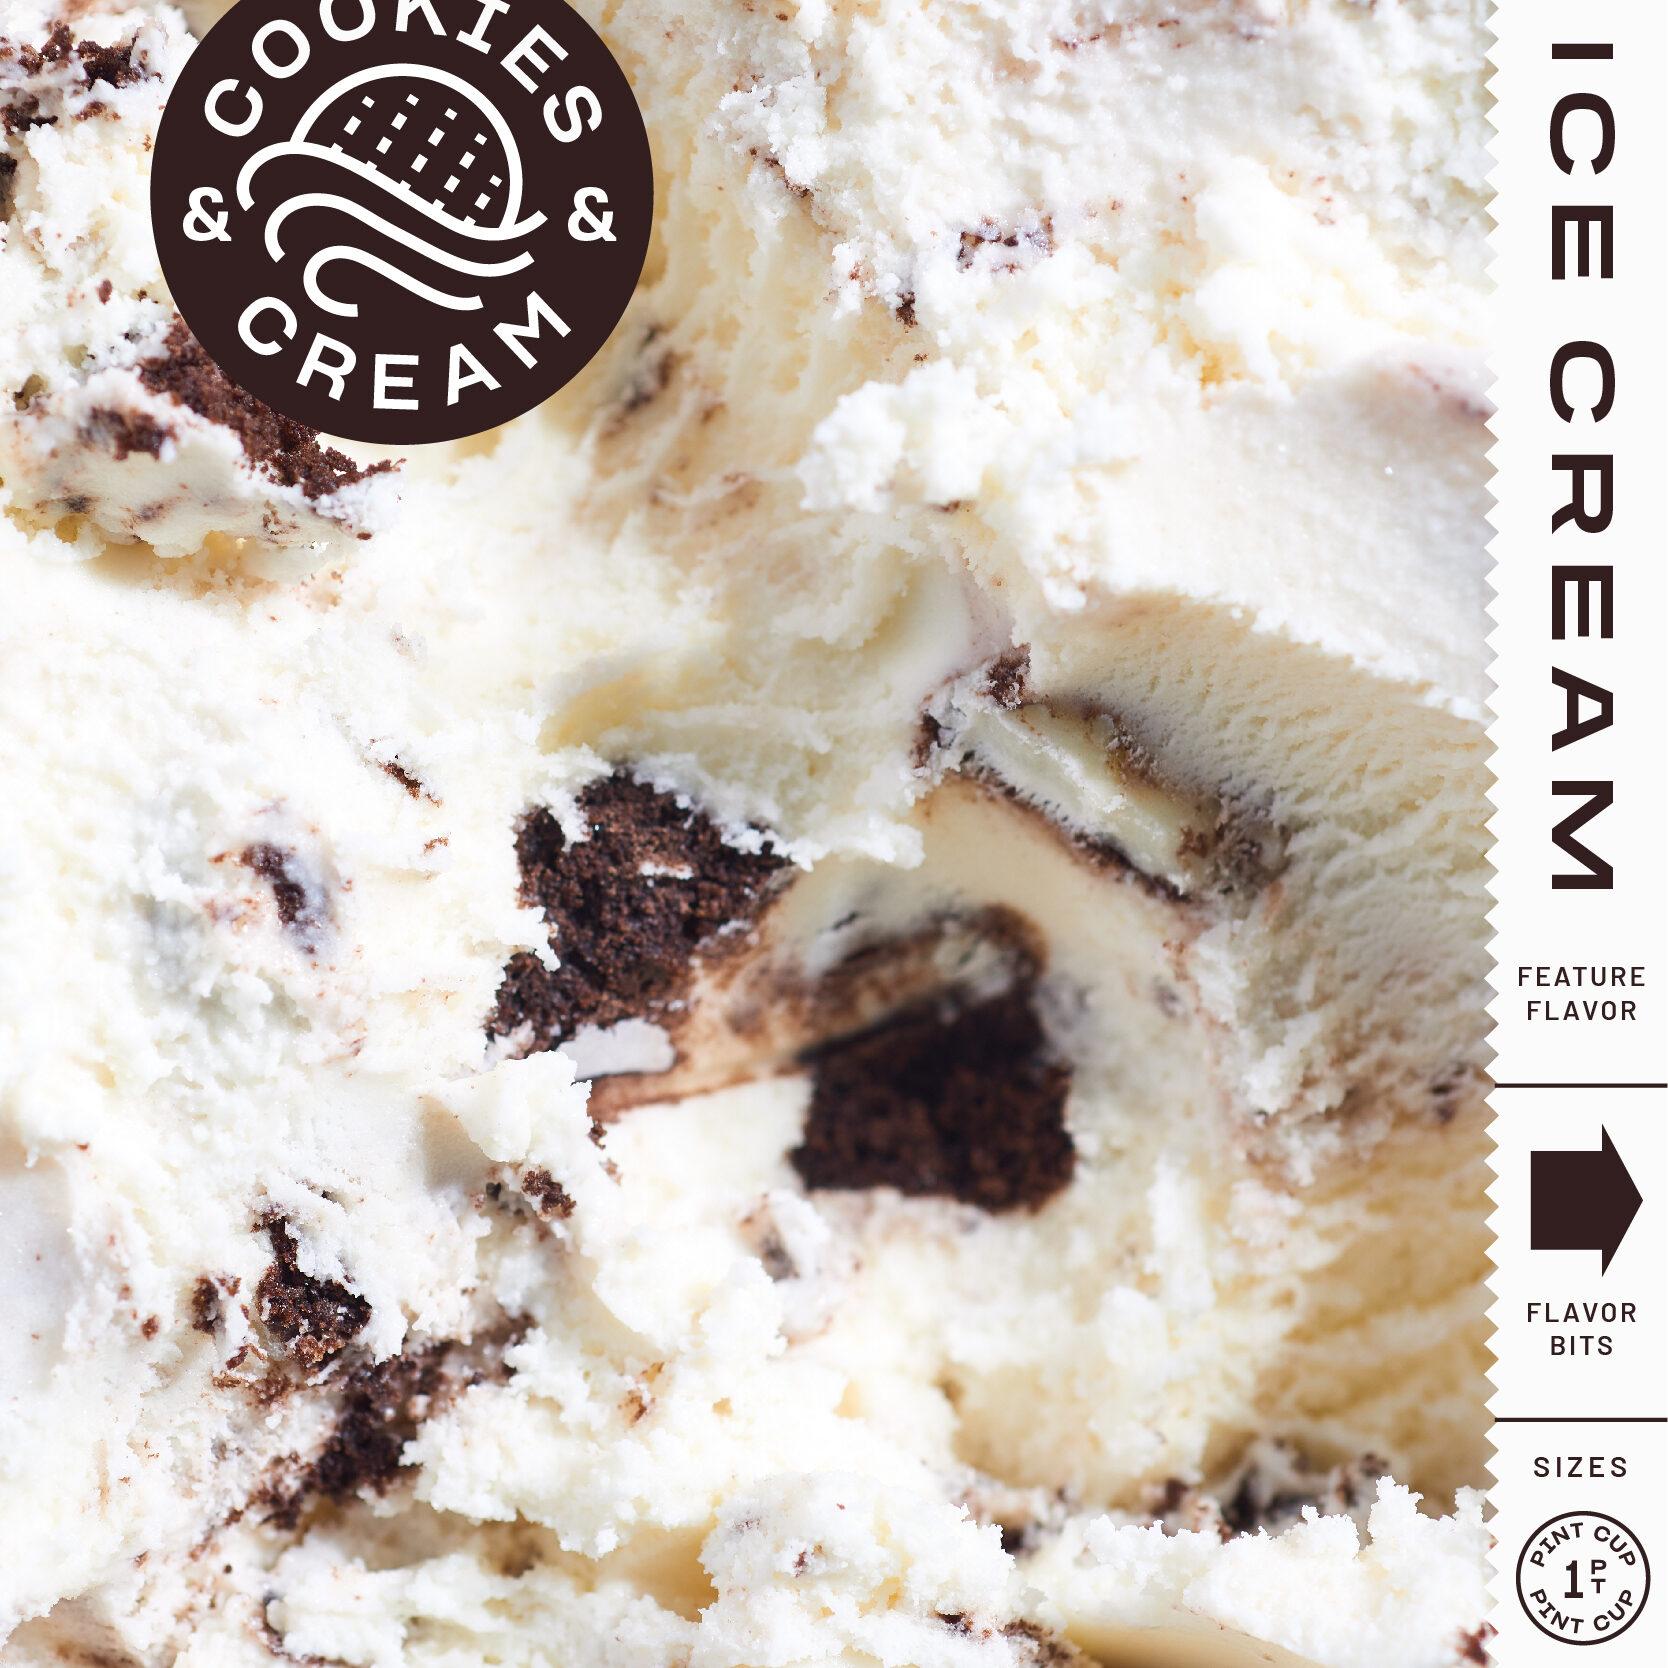 Hartzler-Ice-Cream-Cookies-Cream-19